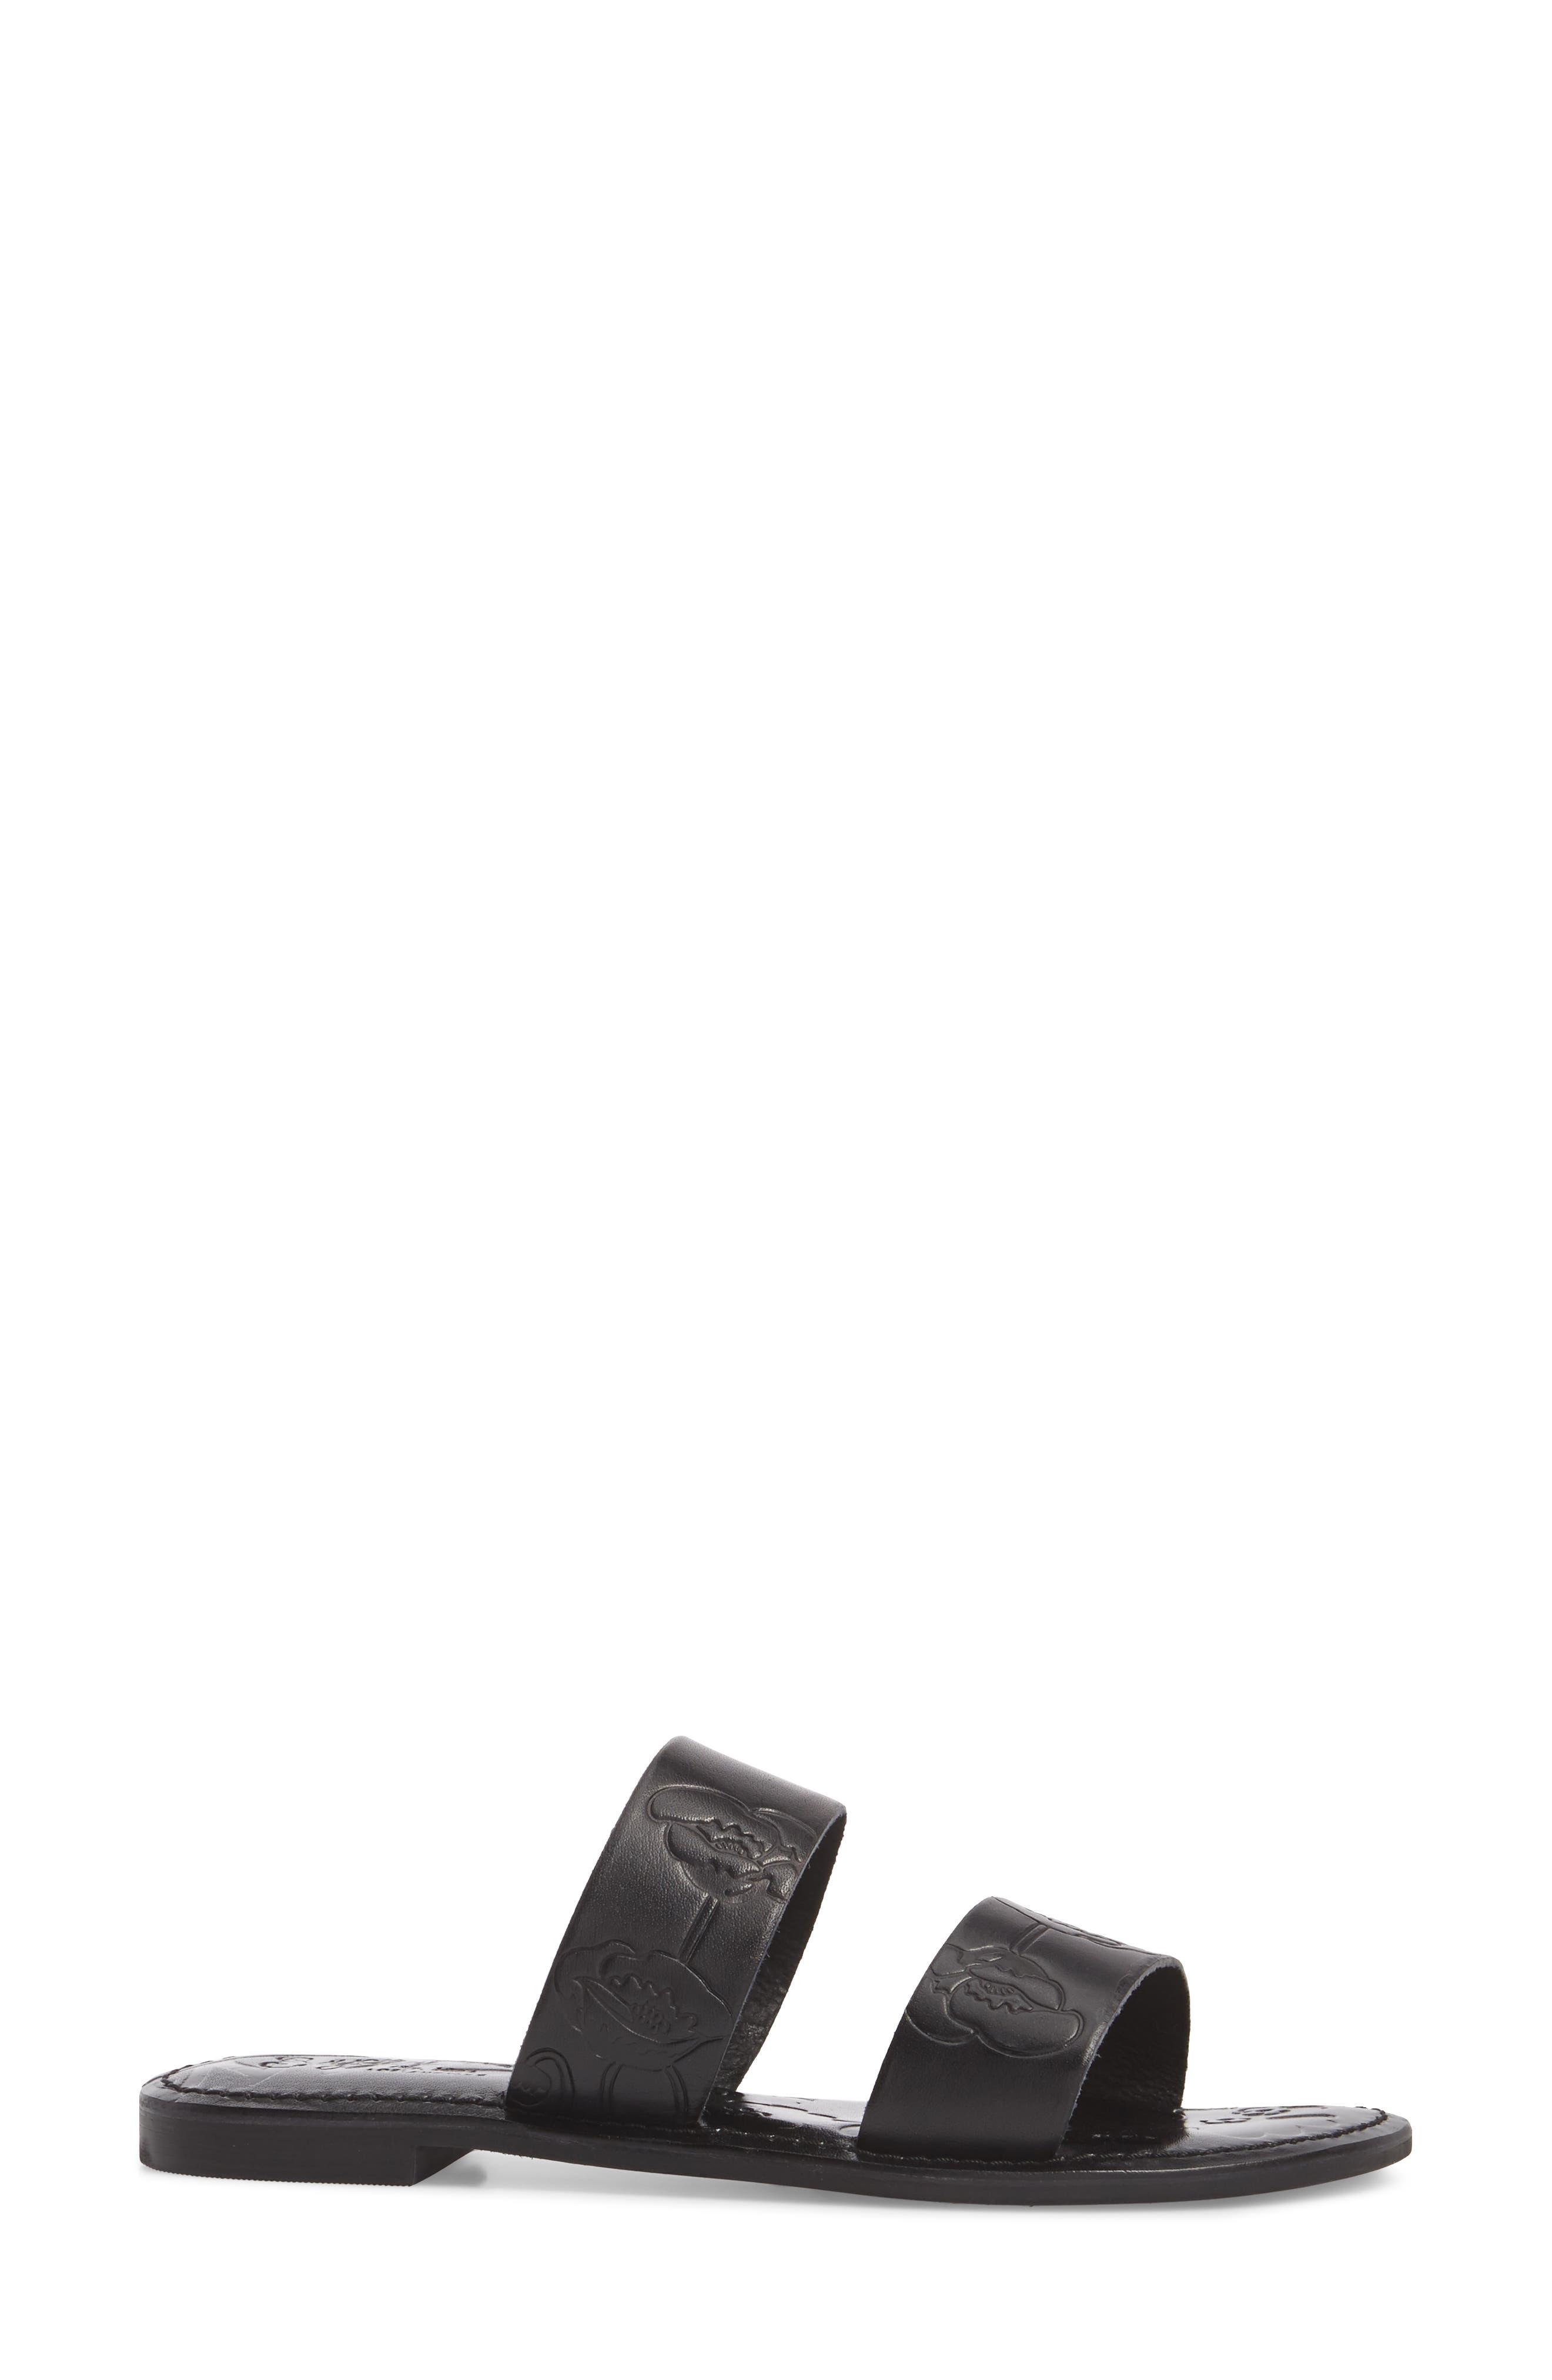 Sheroes Slide Sandal,                             Alternate thumbnail 3, color,                             BLACK LEATHER